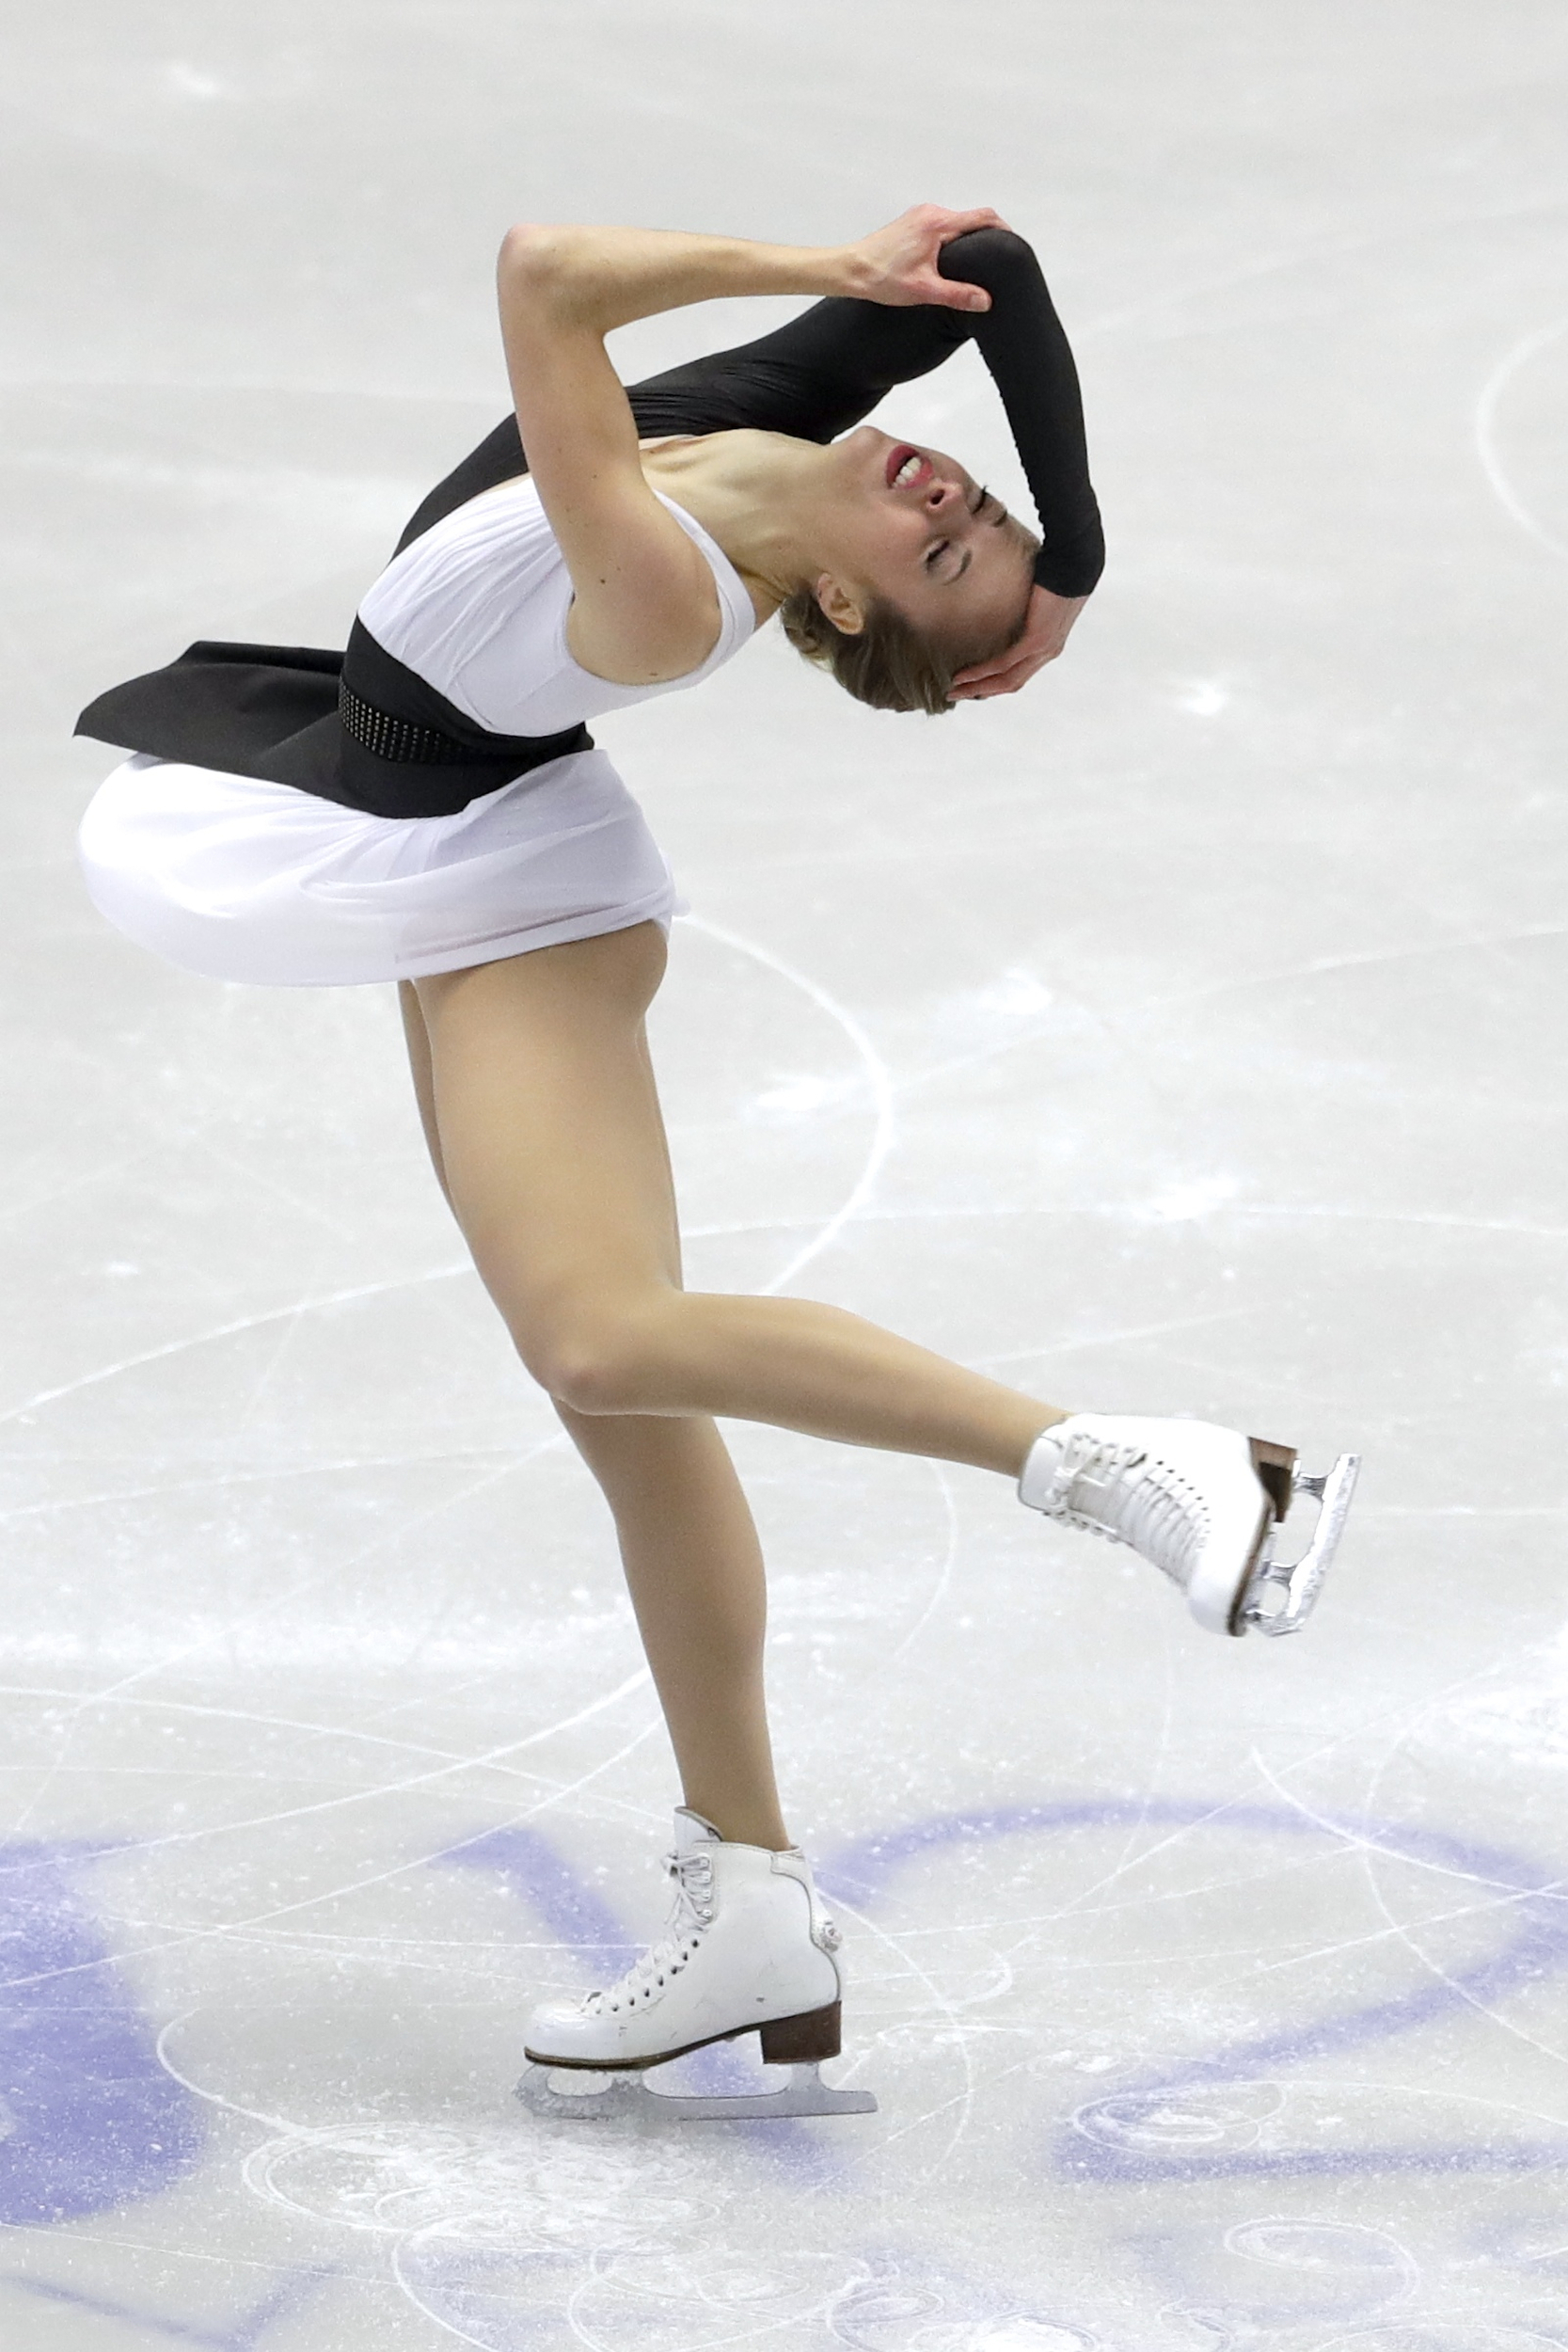 Carolina Kostner, of Italy, skates her short program at the Figure Skating European Championships in Ostrava, Czech Republic, on Wednesday, Jan. 25, 2017. (AP Photo/Petr David Josek)